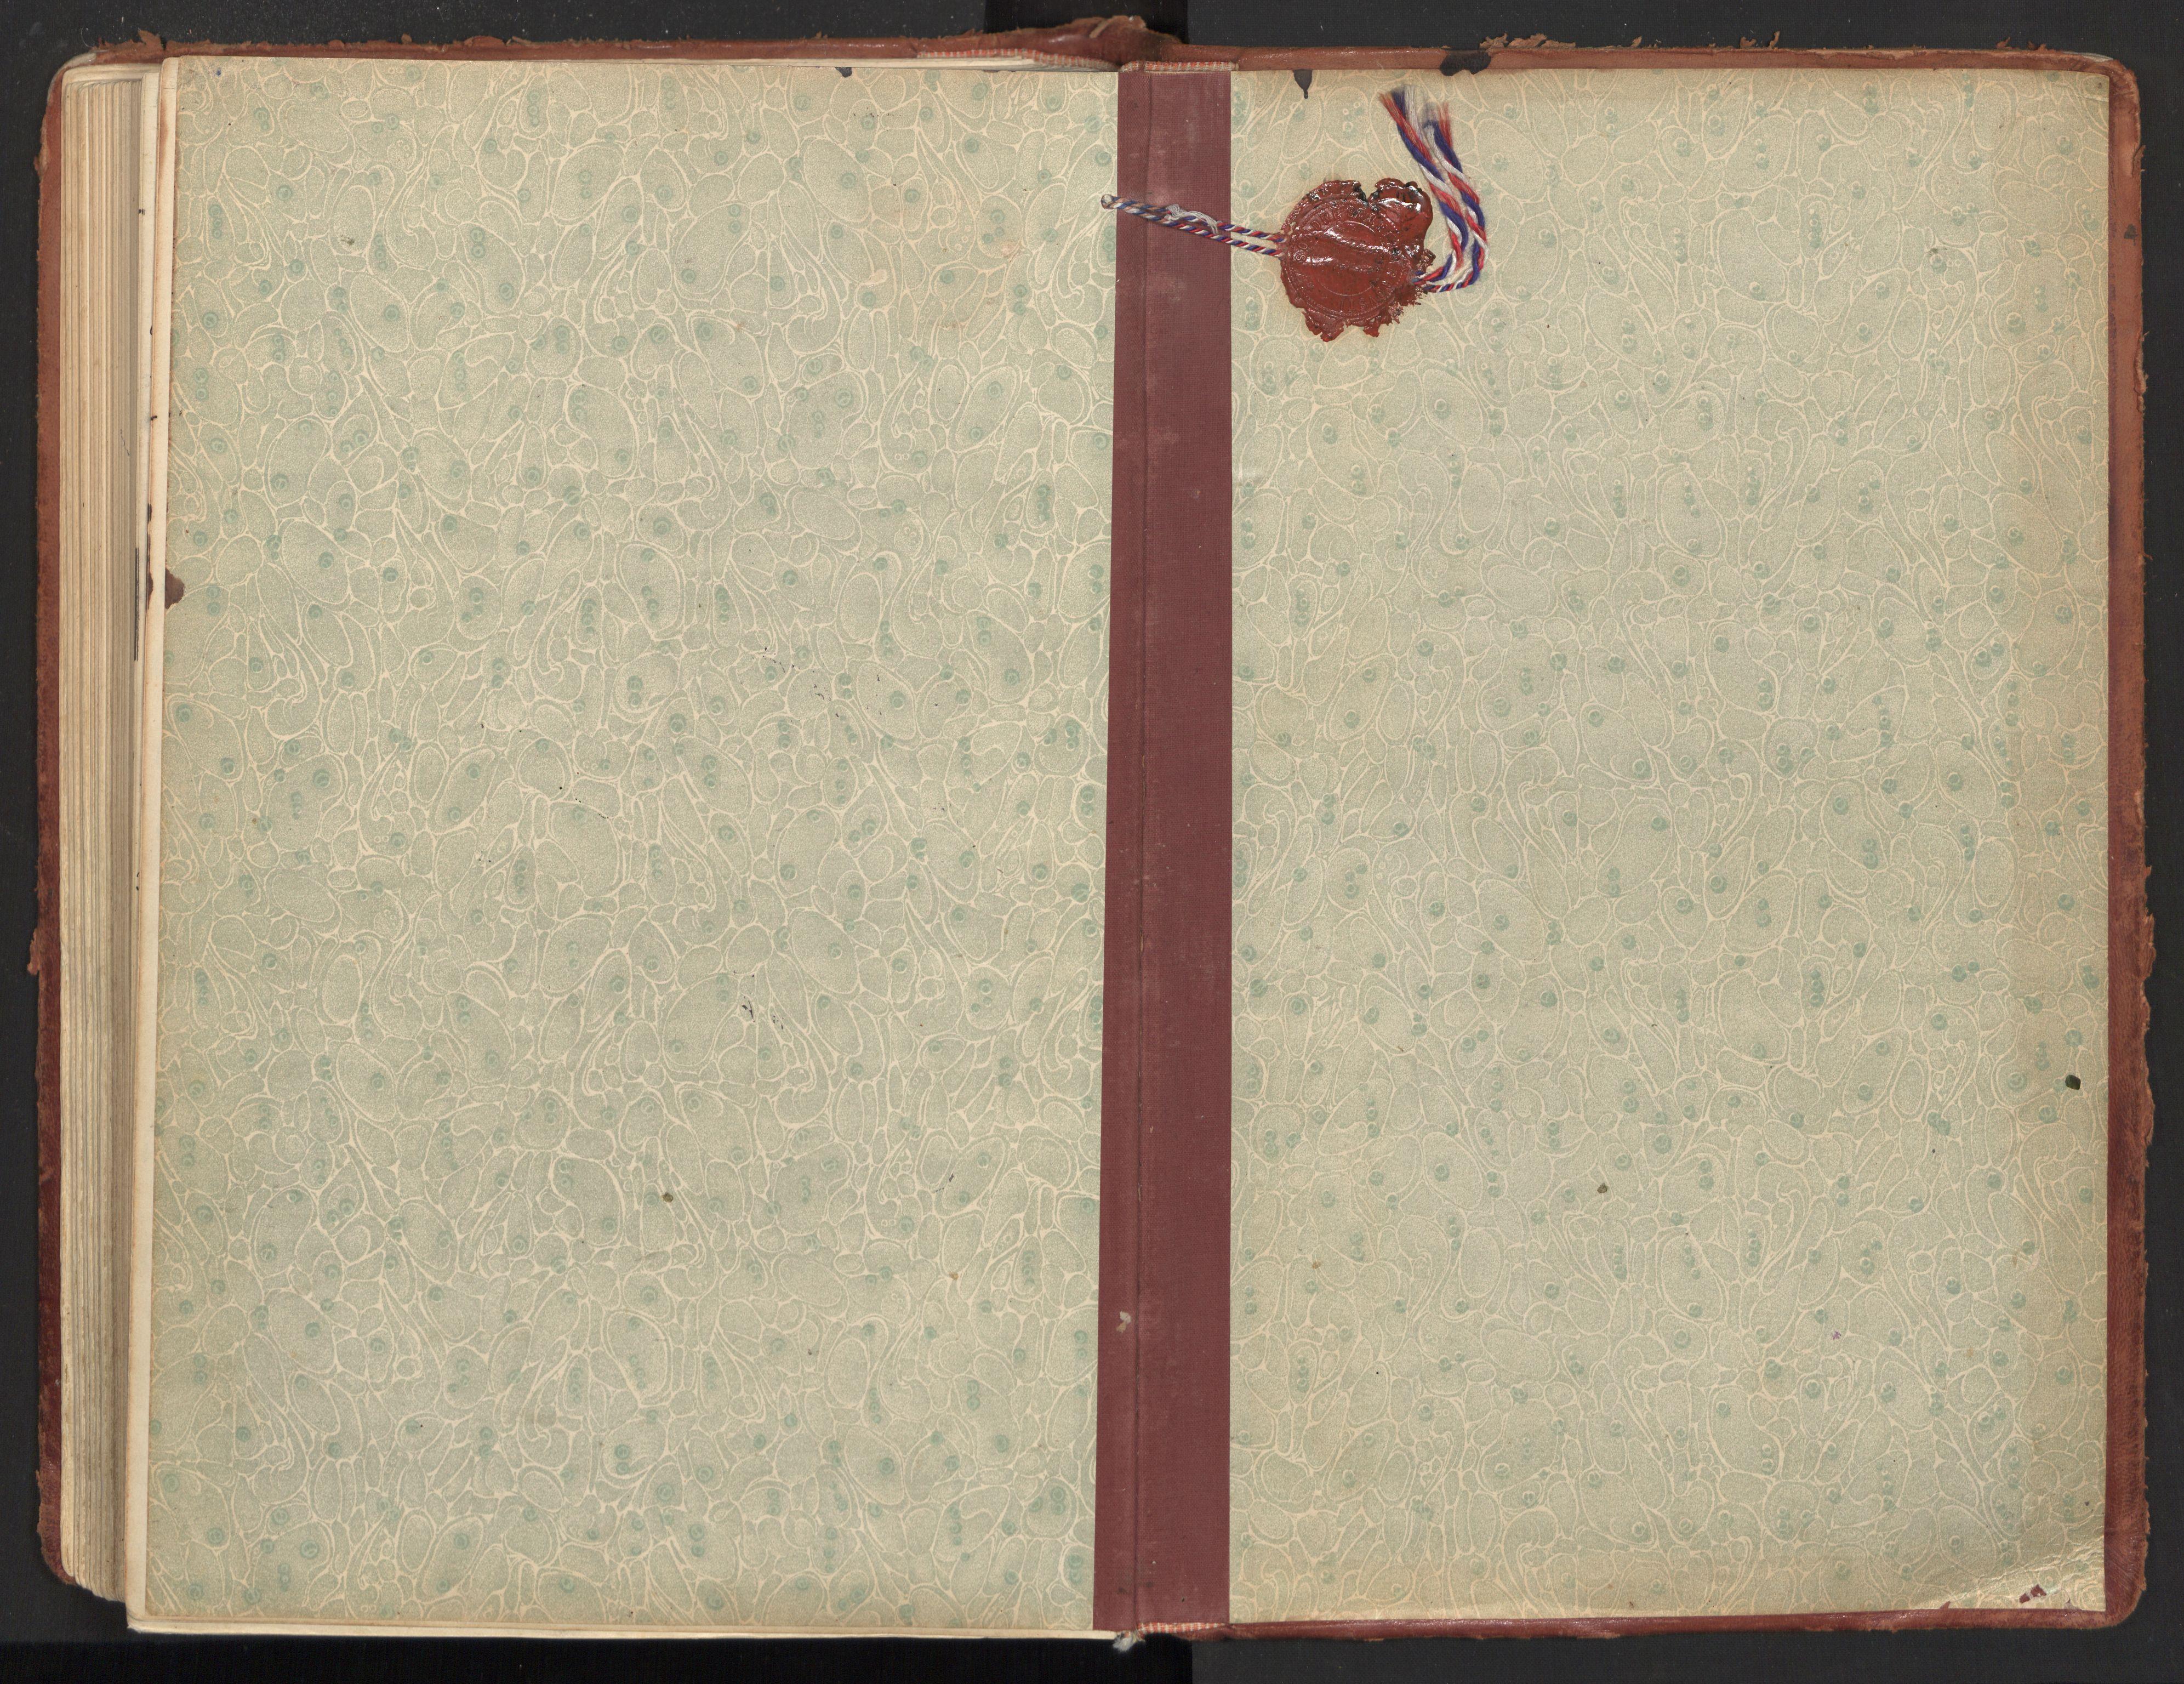 SAT, Ministerialprotokoller, klokkerbøker og fødselsregistre - Nordland, 846/L0650: Ministerialbok nr. 846A08, 1916-1935